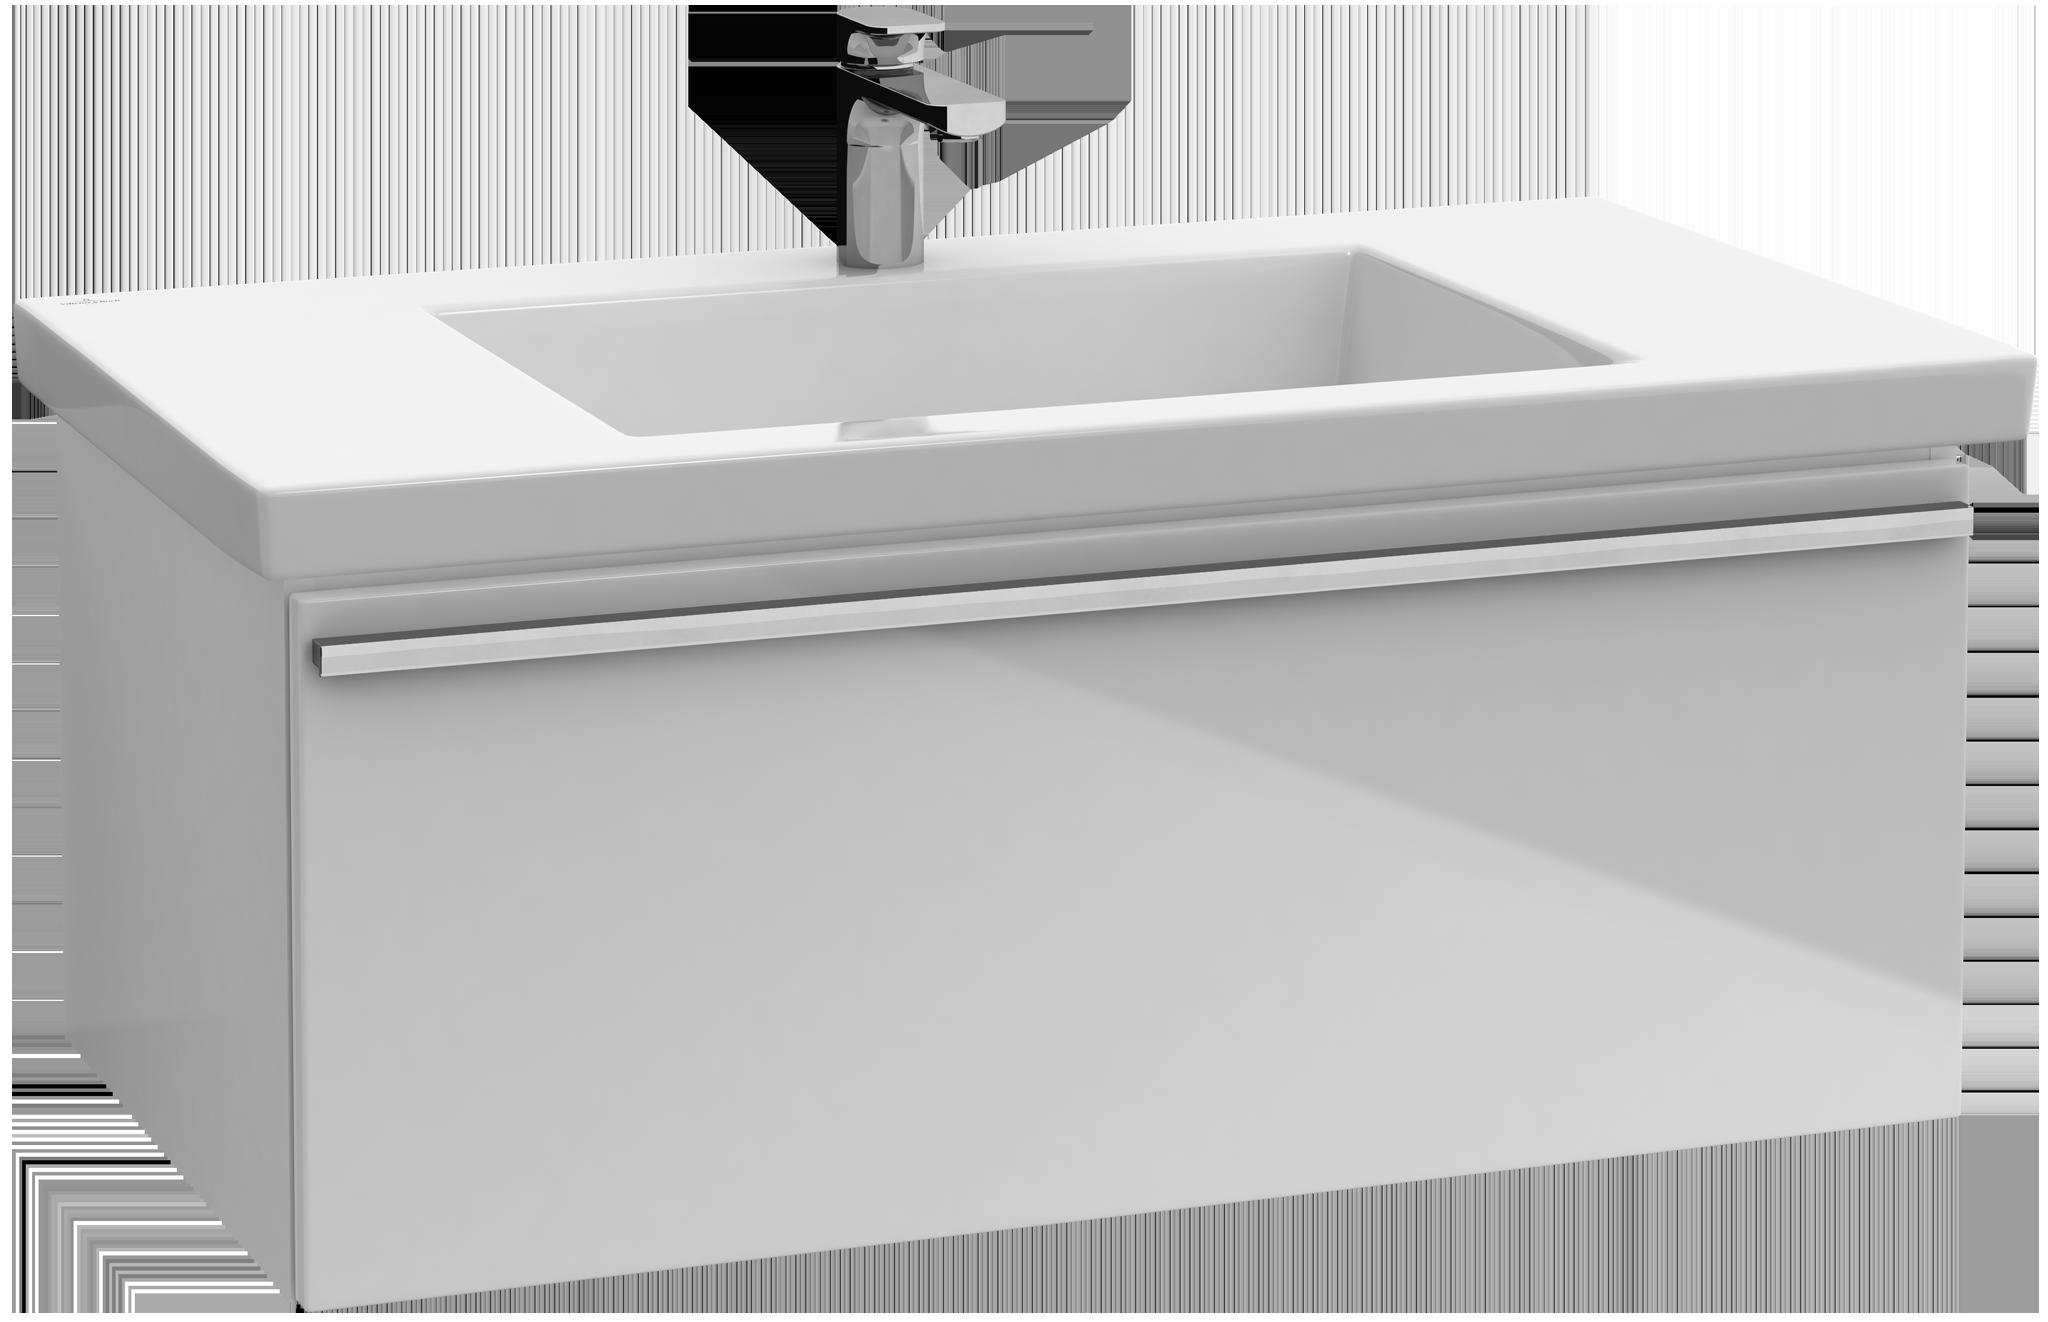 Central line meuble sous lavabo a289e2 villeroy boch for Meuble central